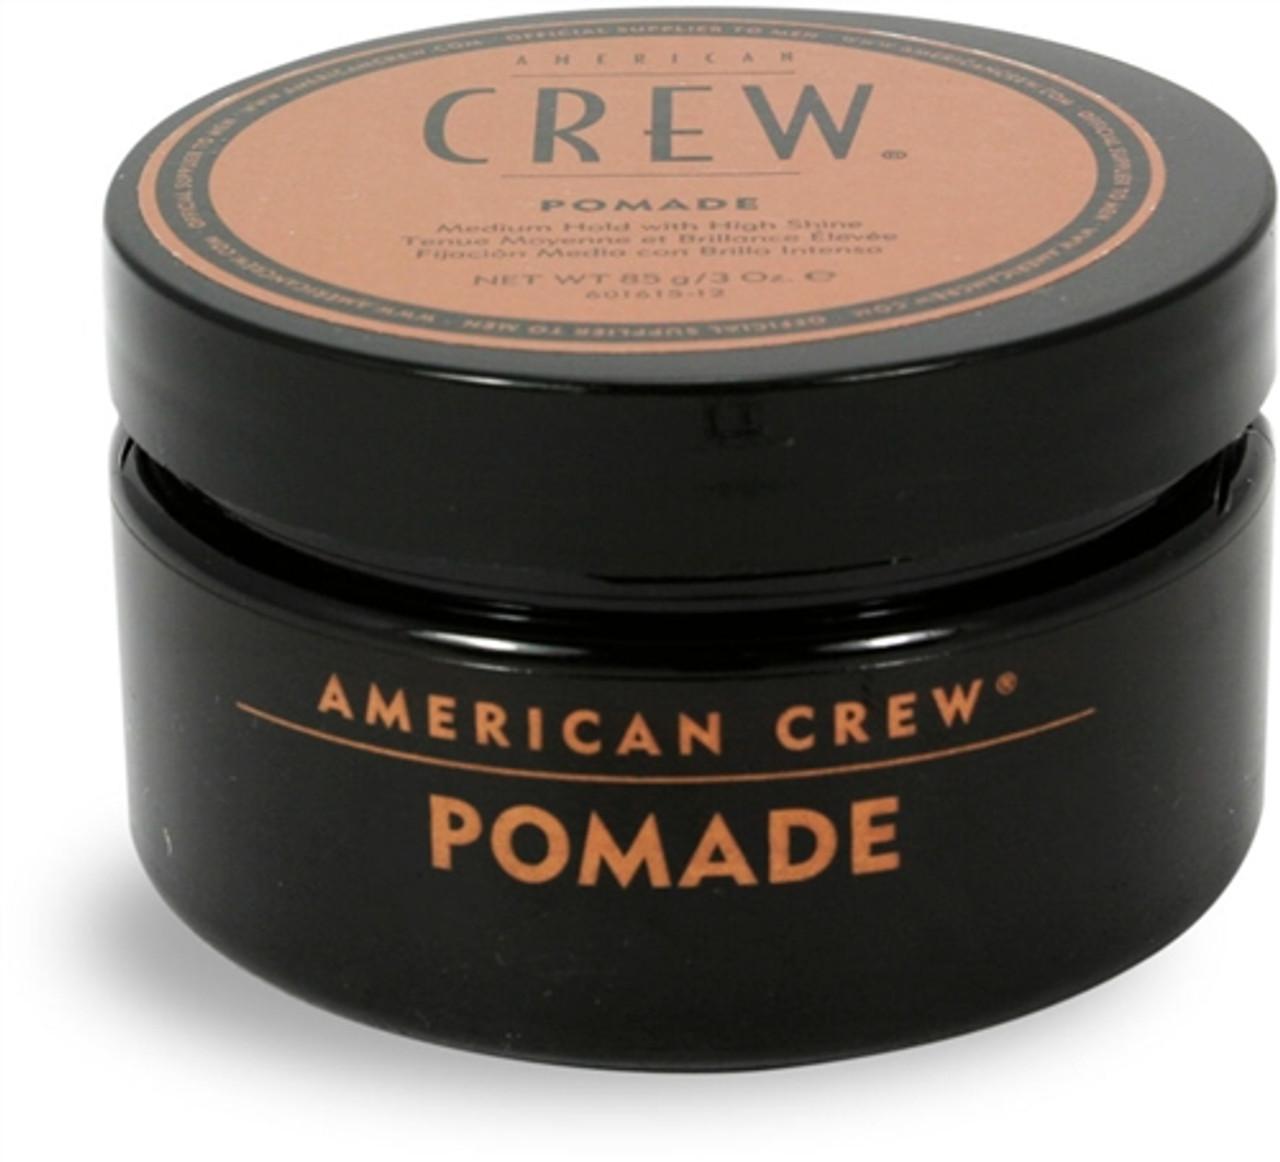 American Crew Pomade - 3.5 OZ